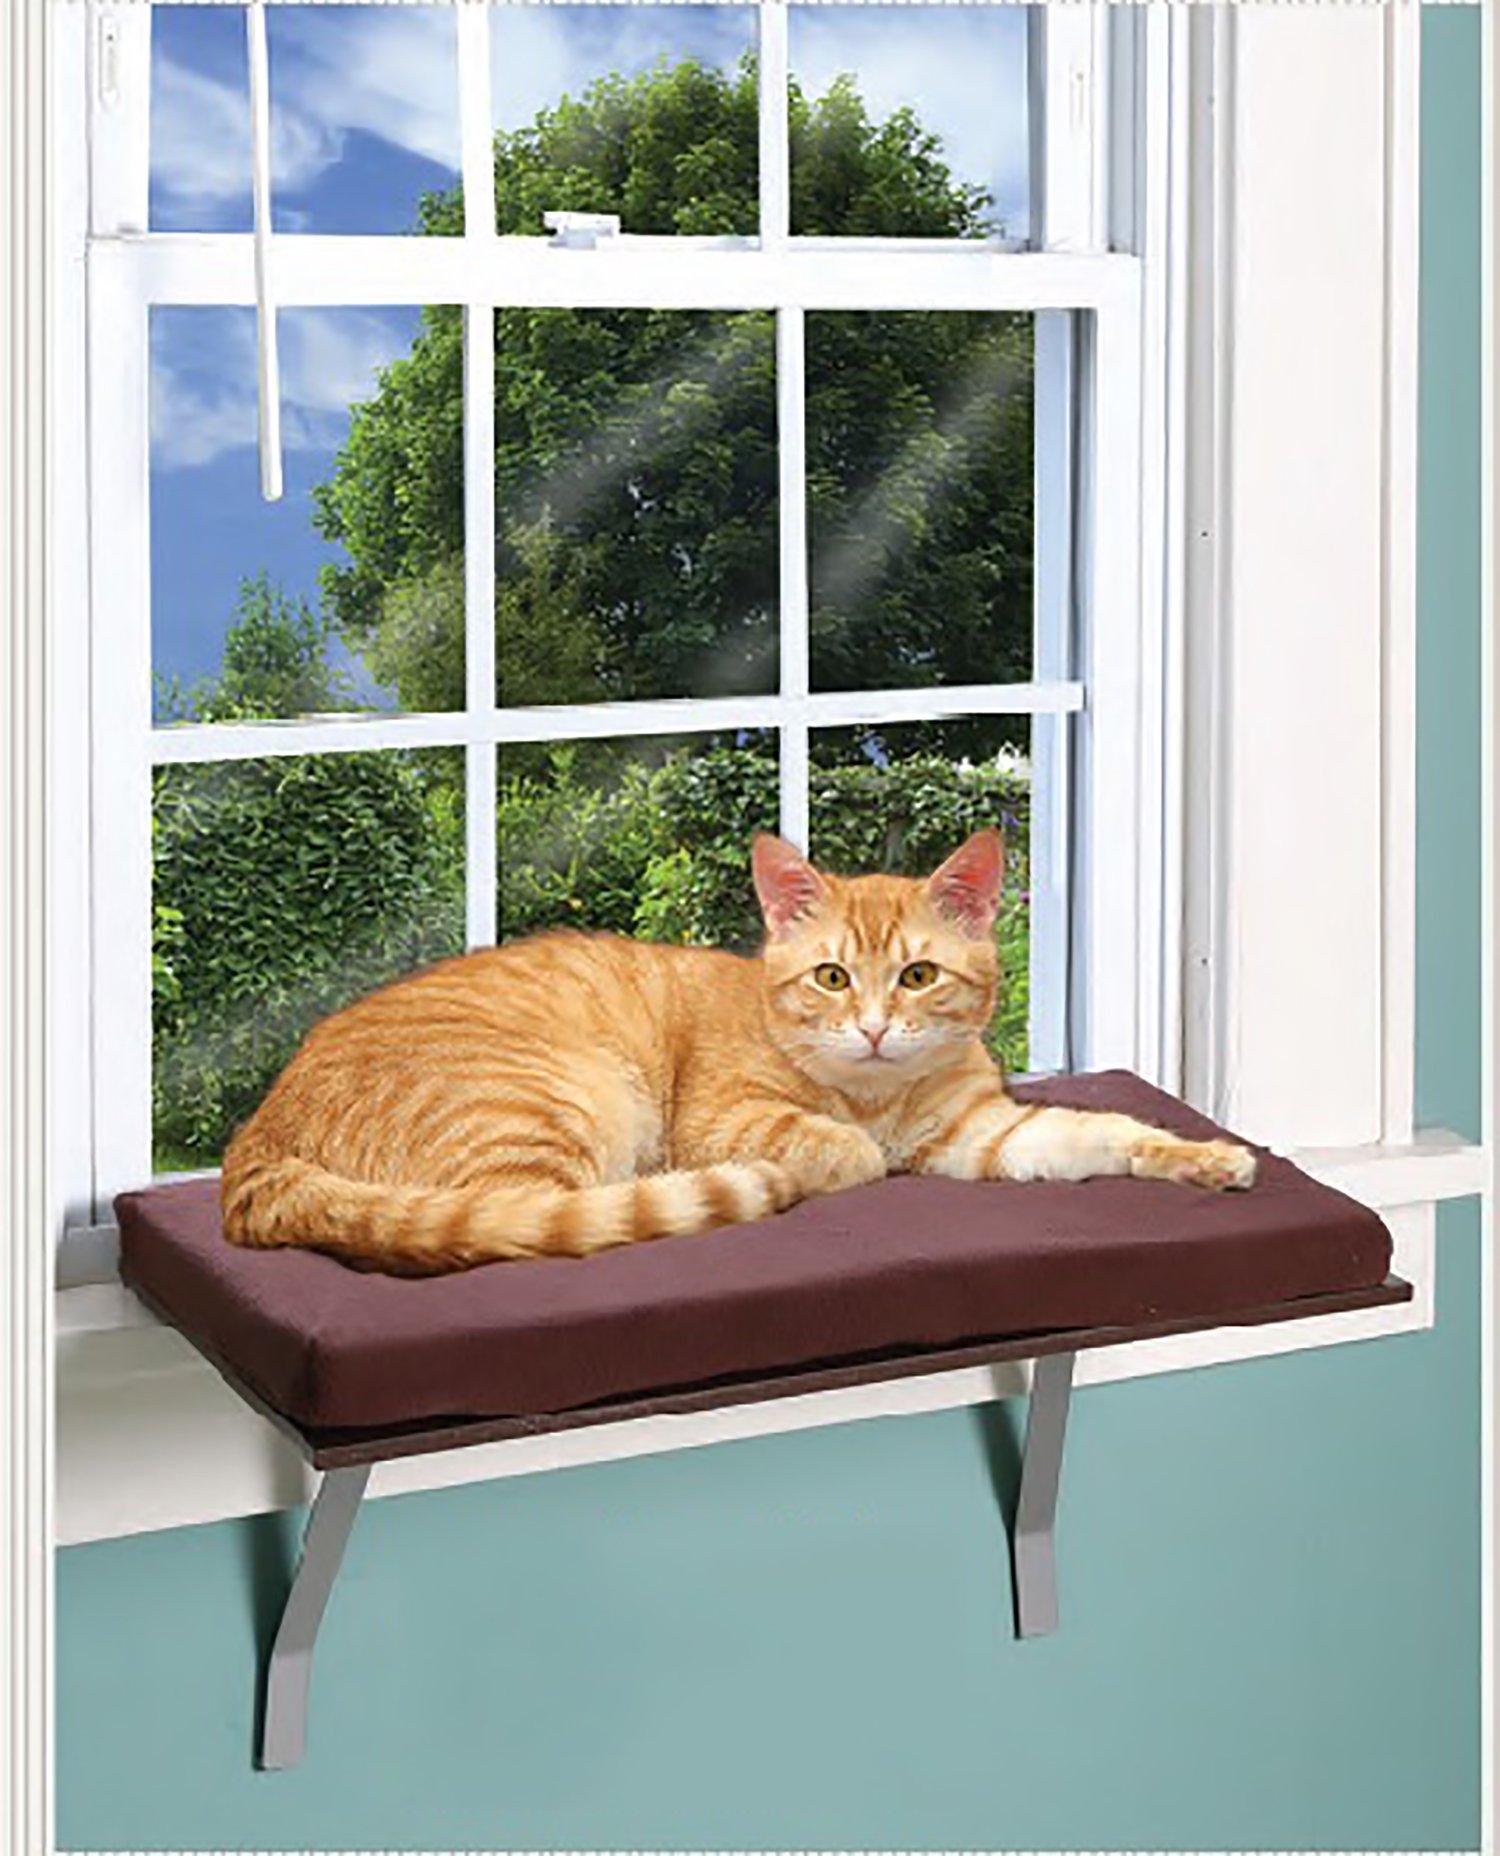 Foam Cushion Deluxe Kitty Window Perch With Fleece Cover